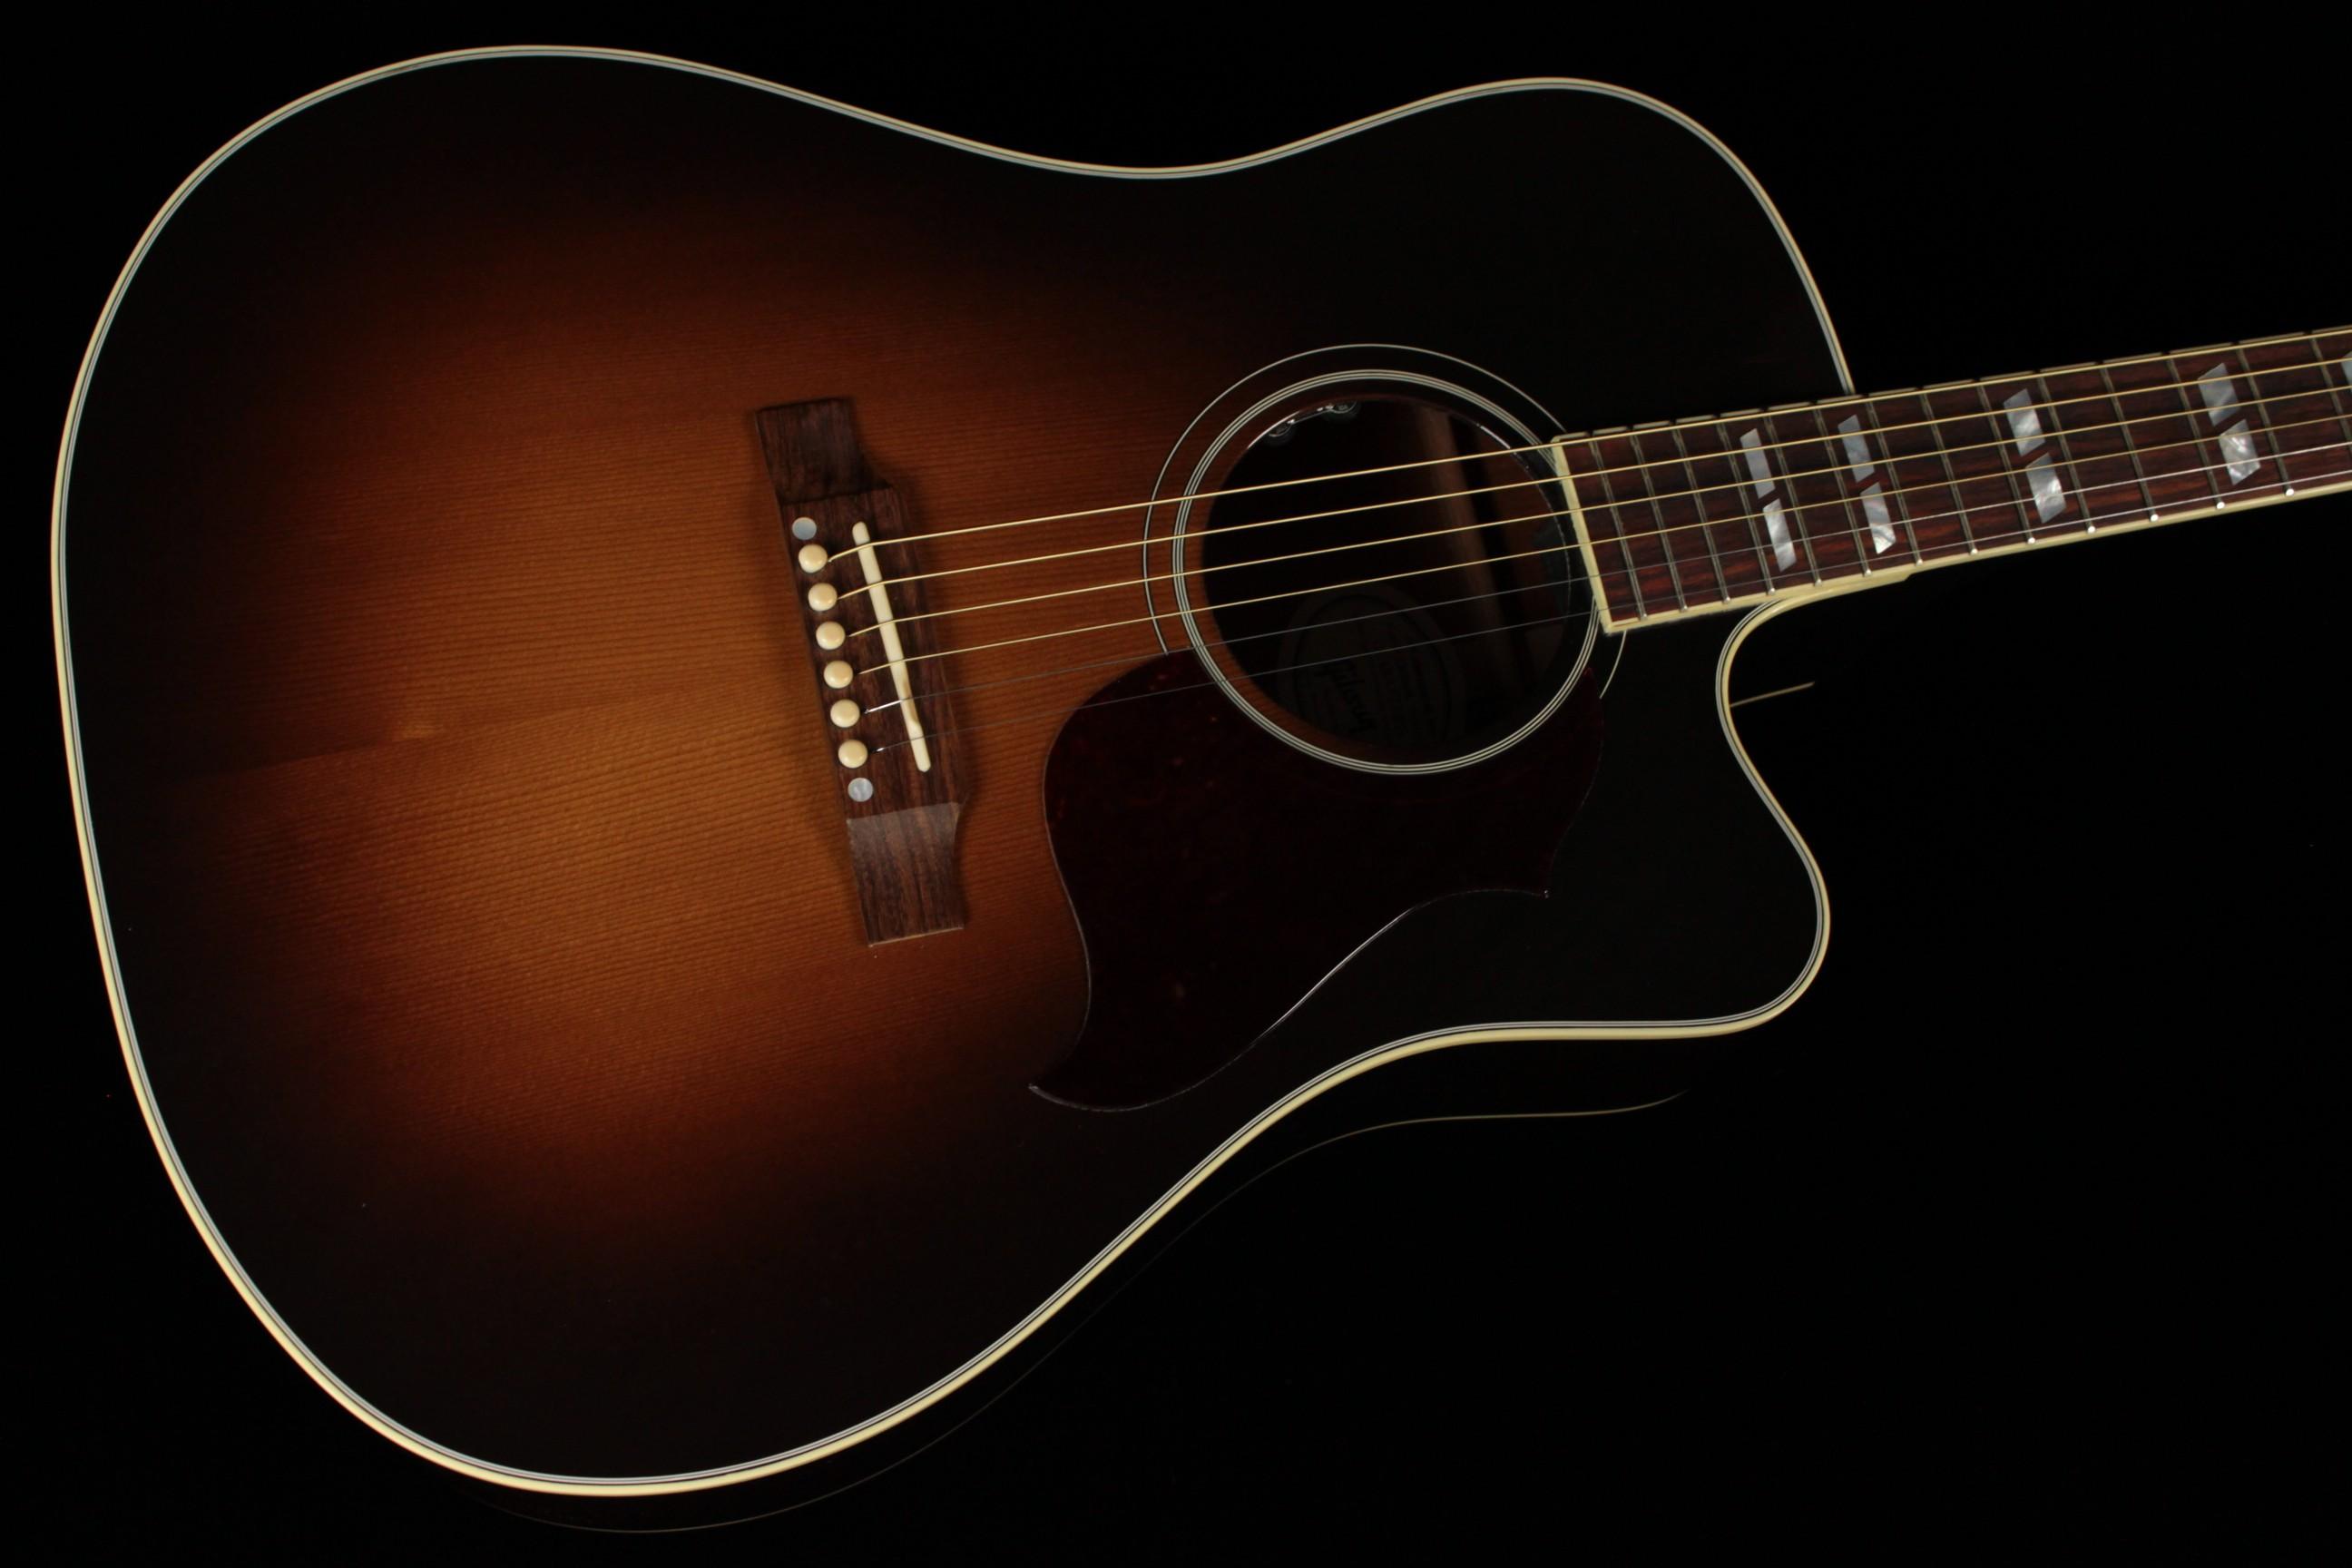 Gibson Hummingbird PRO EC 2016